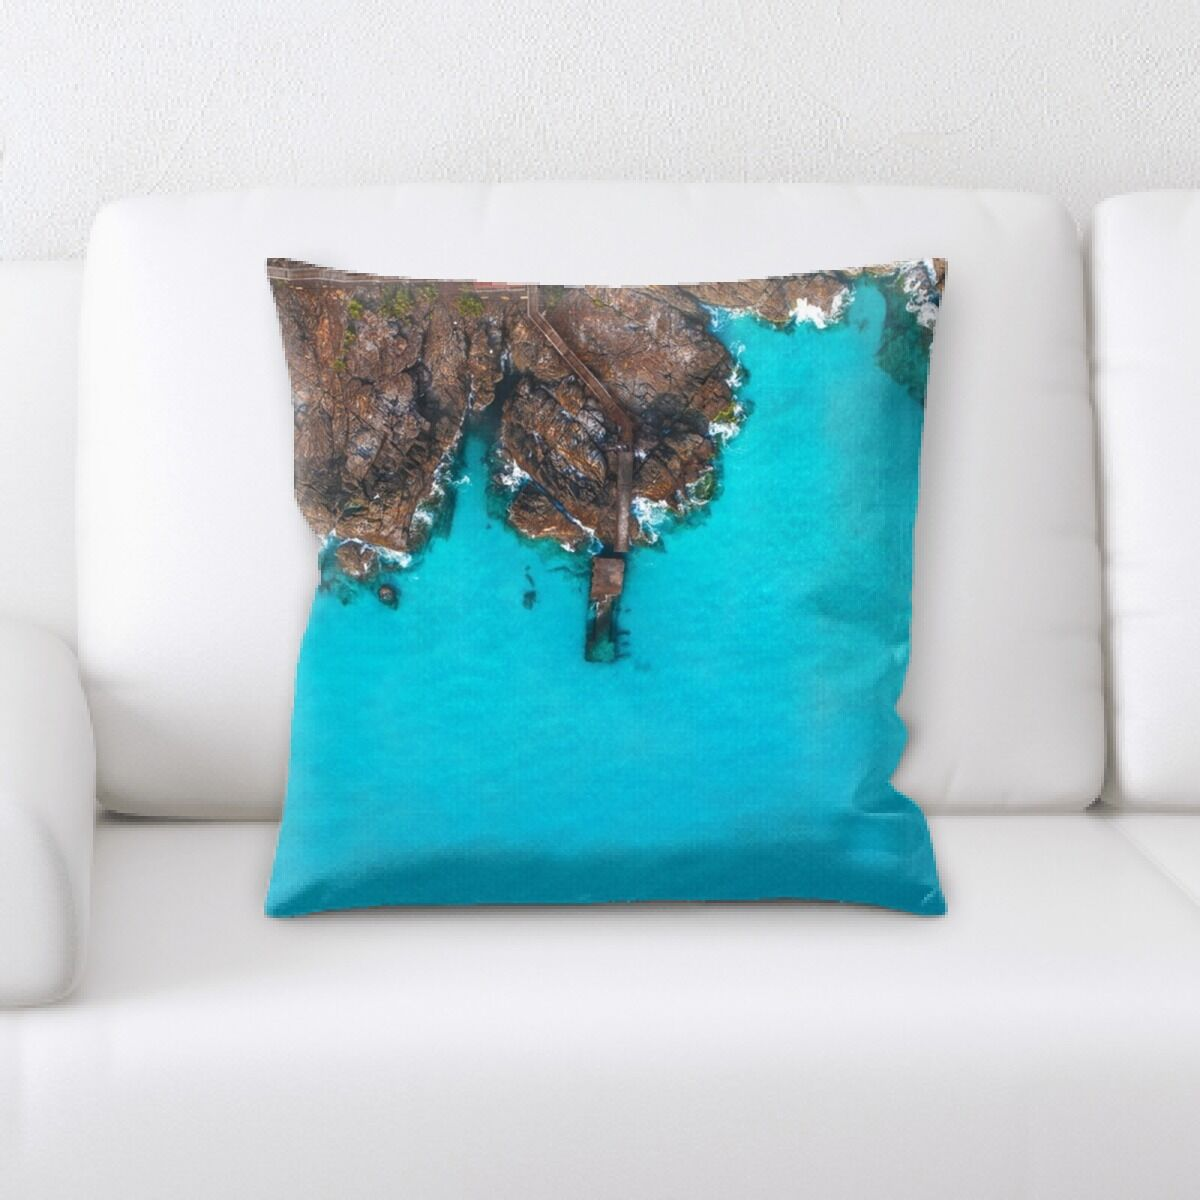 Leidesdorff Mountain and Cliffs (87) Throw Pillow